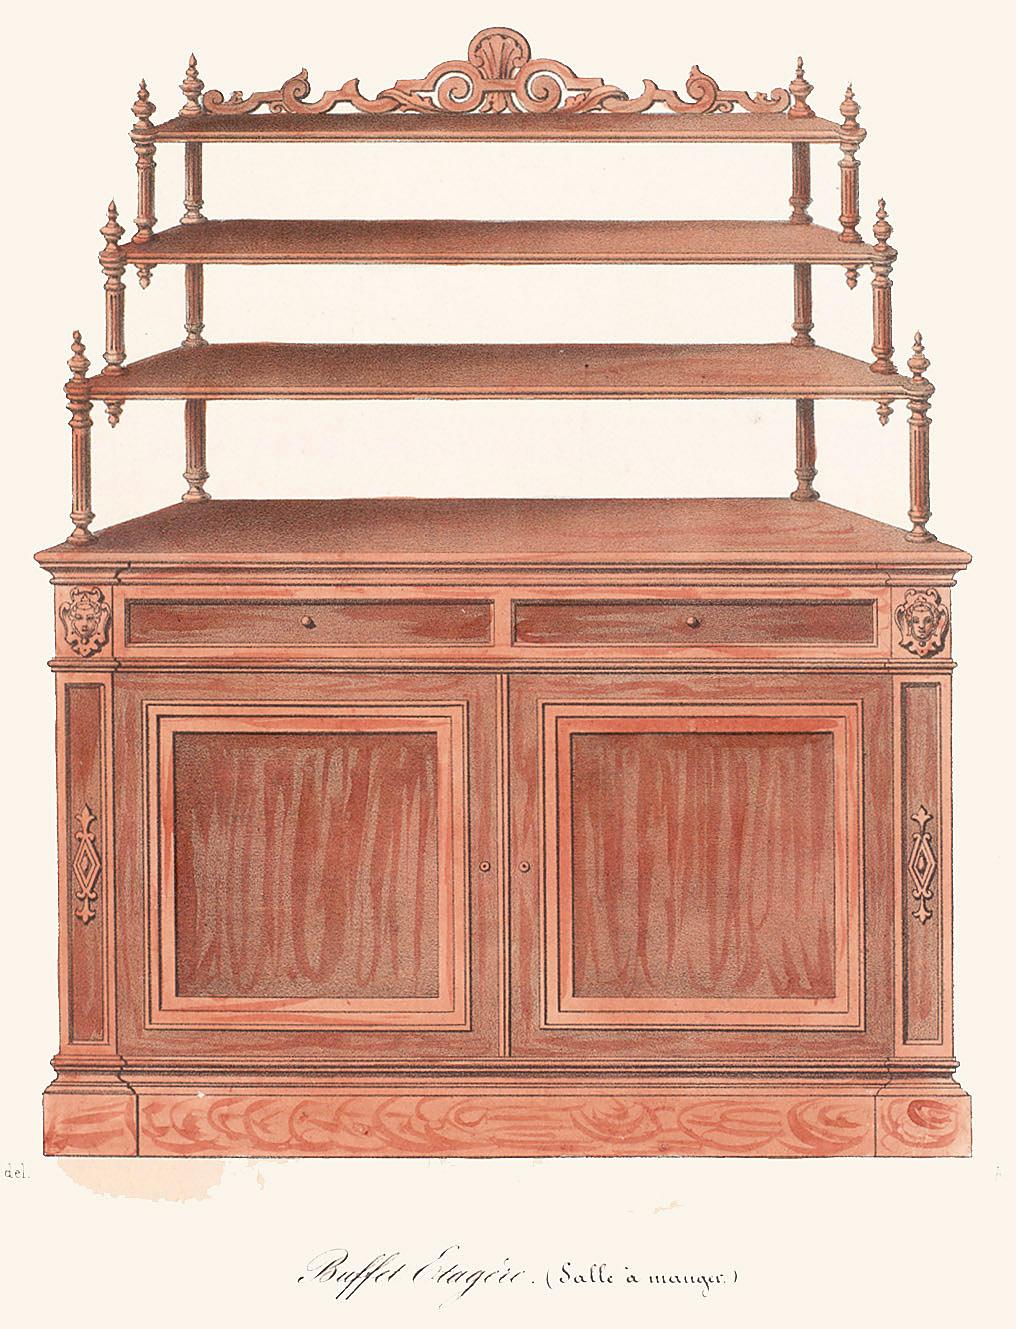 Cabinets (case furniture),  Image number:SIL12-2-078b